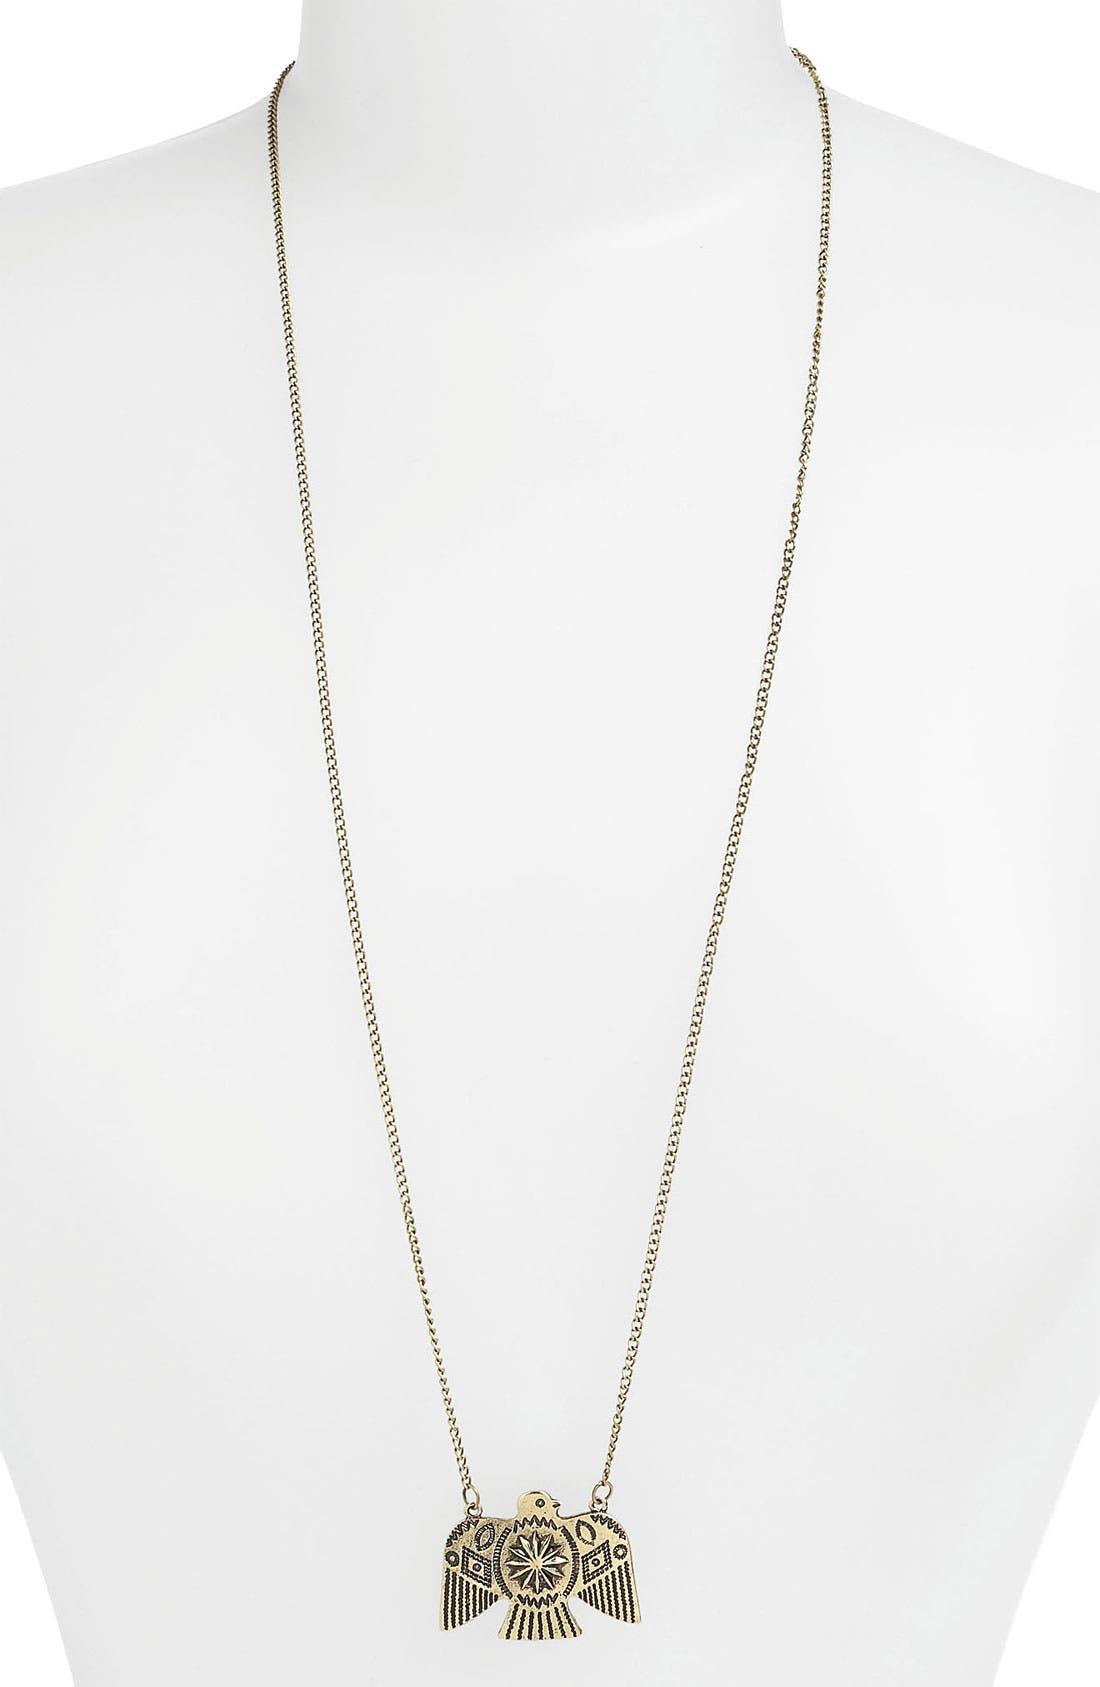 Alternate Image 1 Selected - Devan Eagle Pendant Necklace